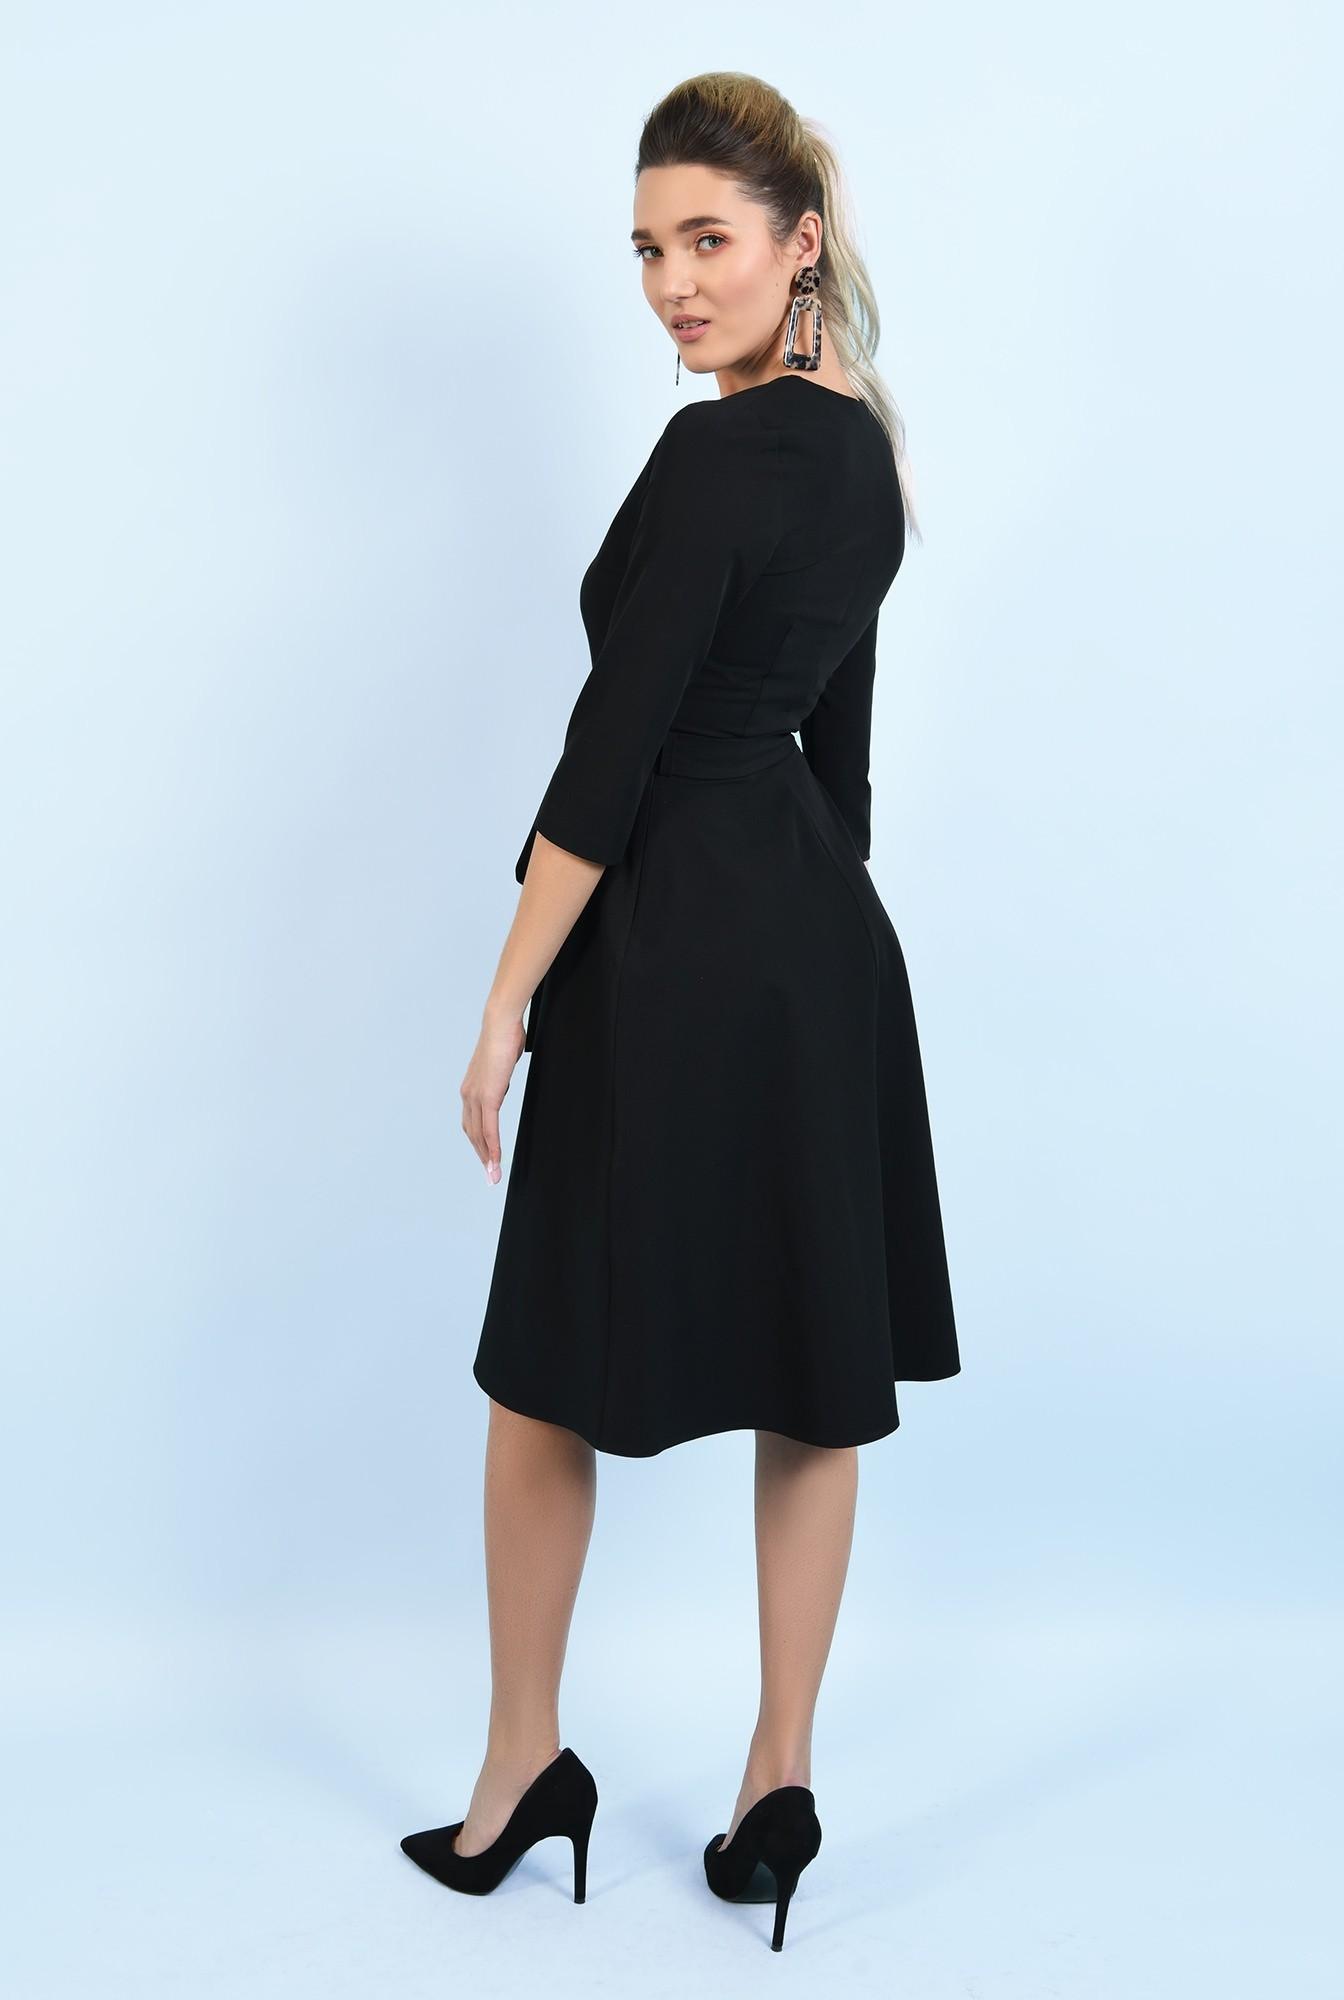 1 - 360 - rochie office, neagra, midi, cu nasturi, cu cordon